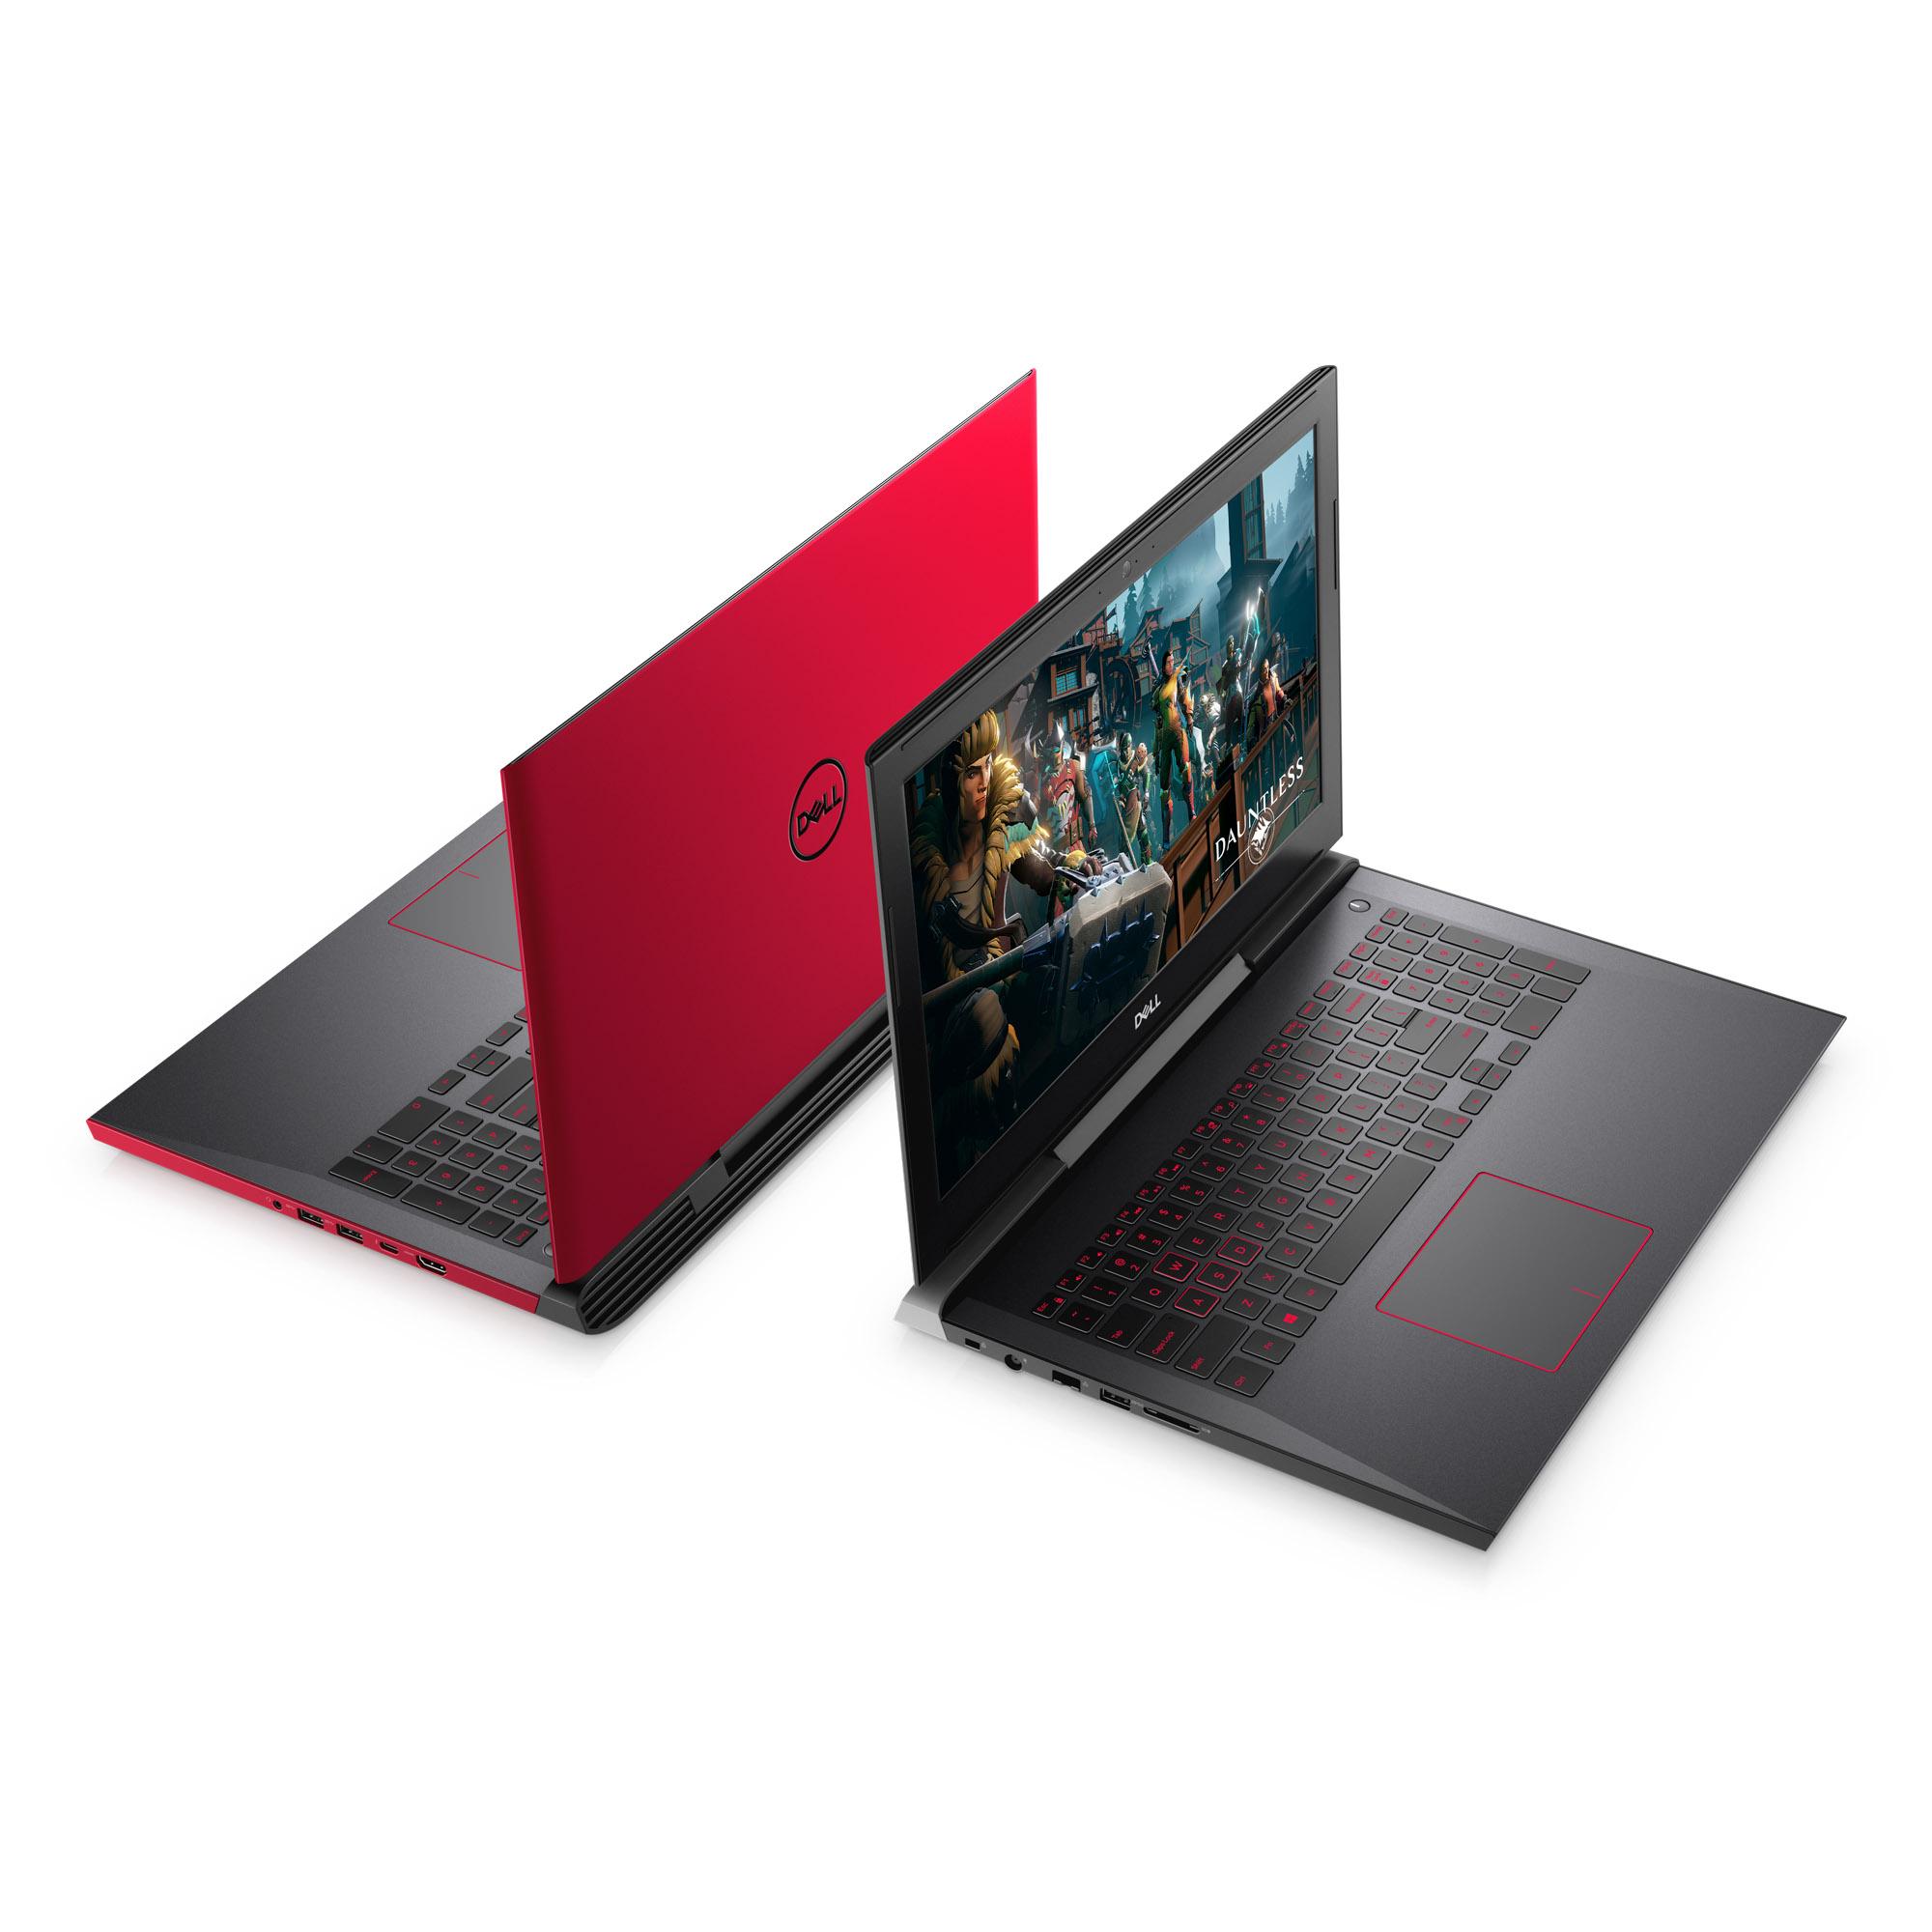 Megújult Dell és Alienware termékportfólió